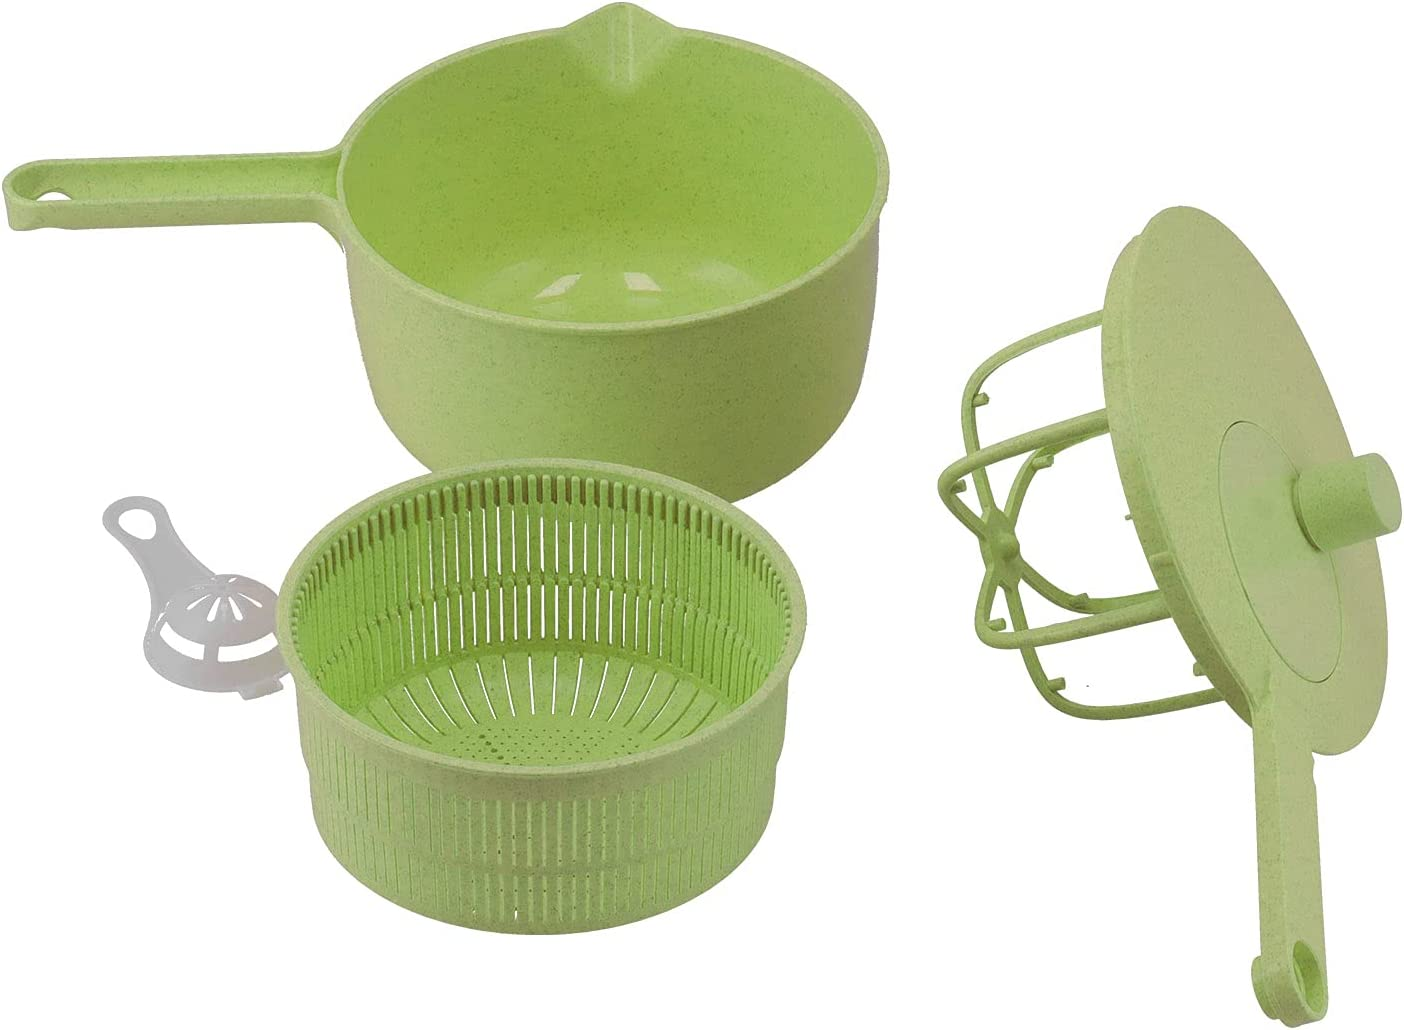 Alvinlite Salad Spinners Multifunctional Vegetable Finally resale start Sale SALE% OFF Drainer Frui